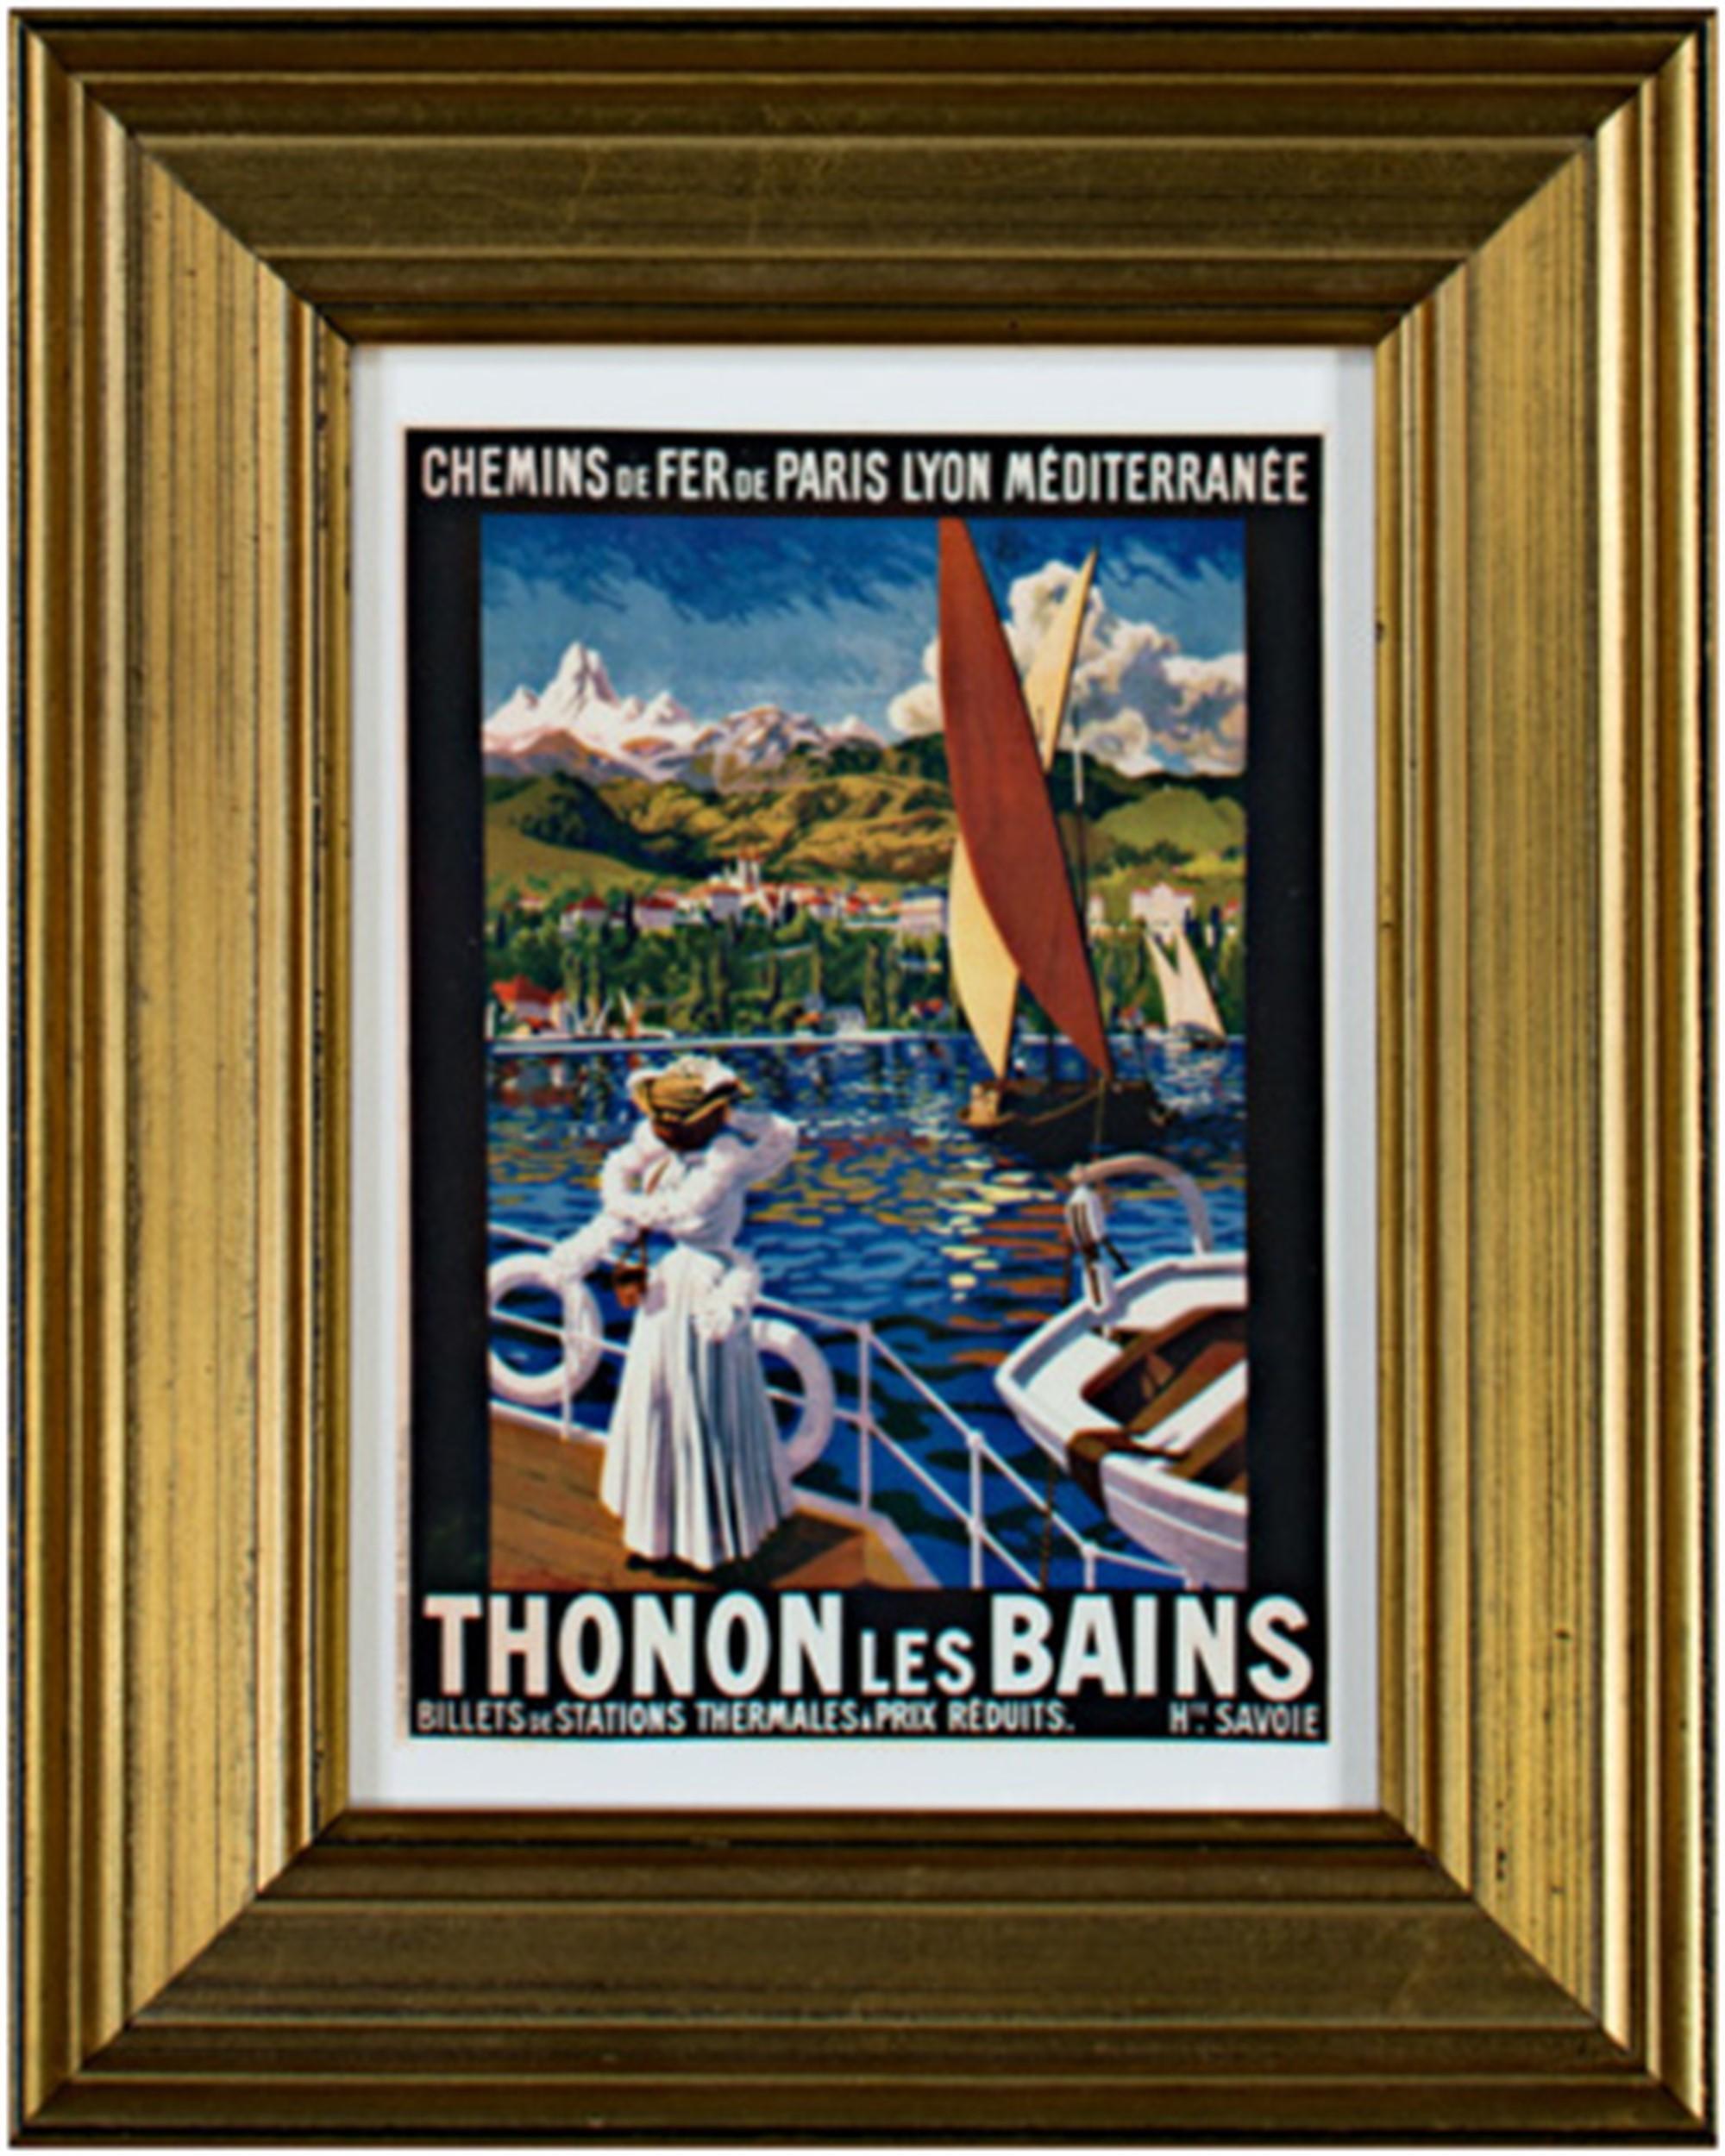 Thonon Les Bains by Robert Boullier